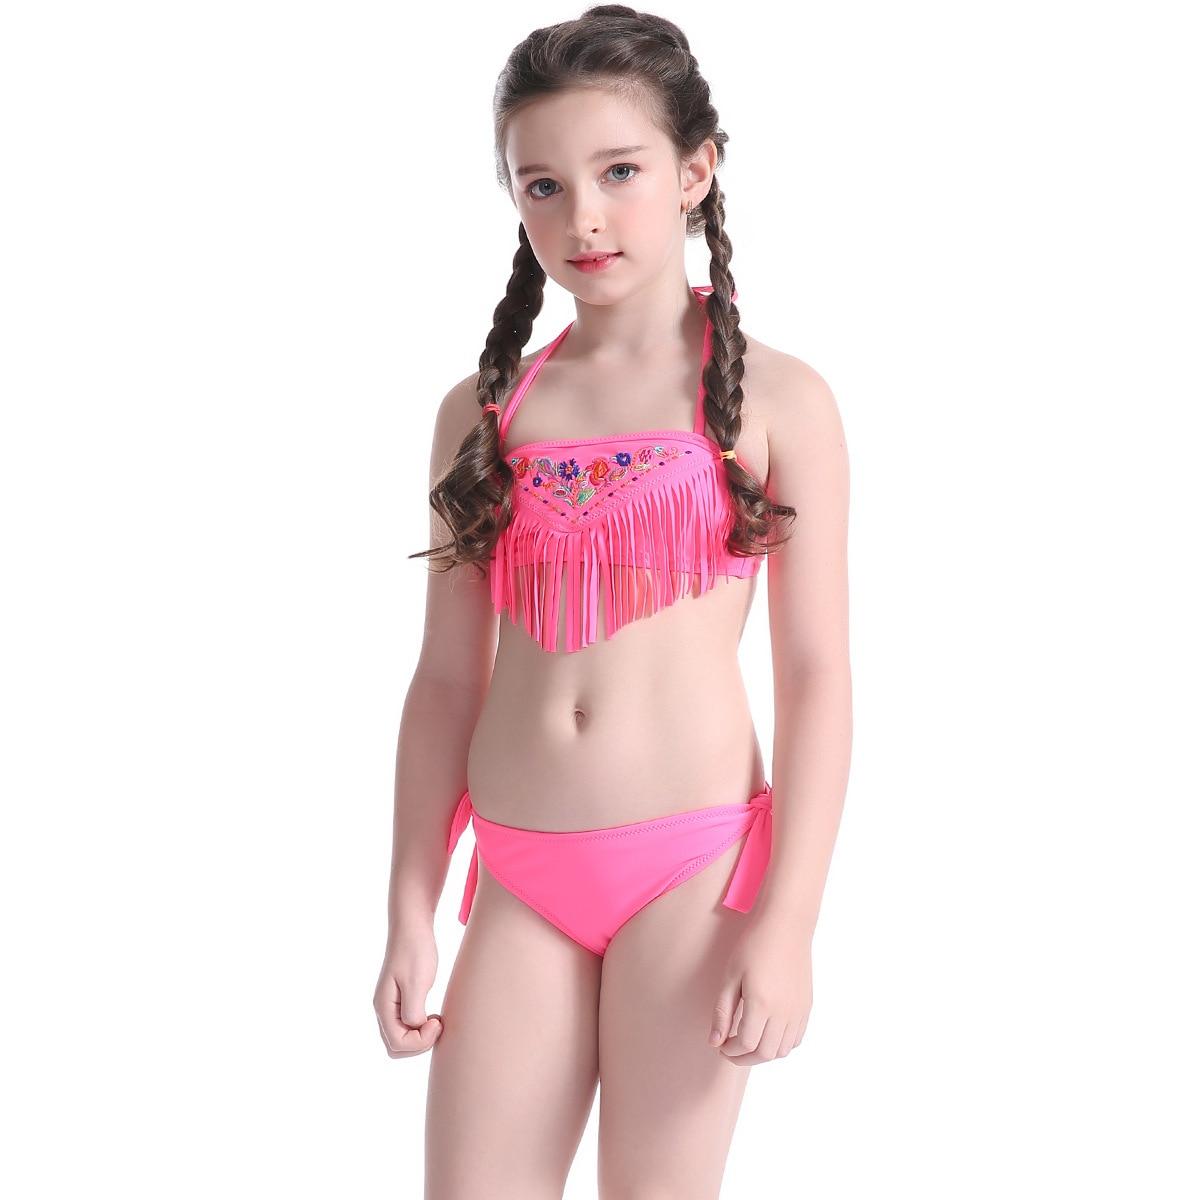 cuckold-teen-chinese-teen-czech-swimsuit-kaedashianbooty-nude